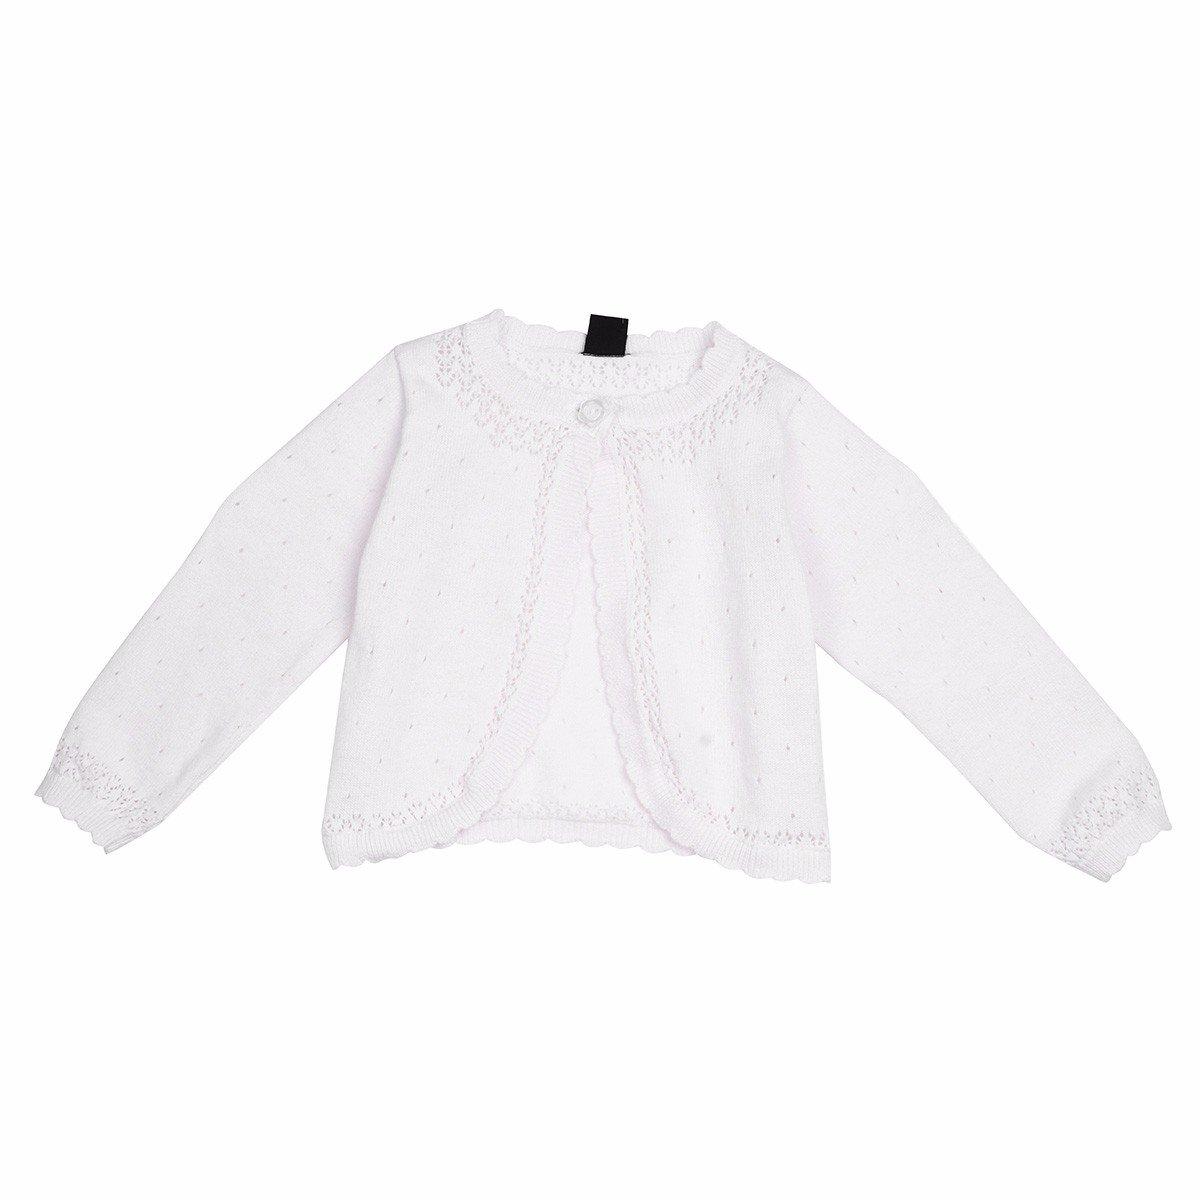 FEESHOW Baby Girls Long Sleeve Knit Cardigan Sweater Dress Cover Up Bolero Shrug White 18-24 Months (Tag Size XL)